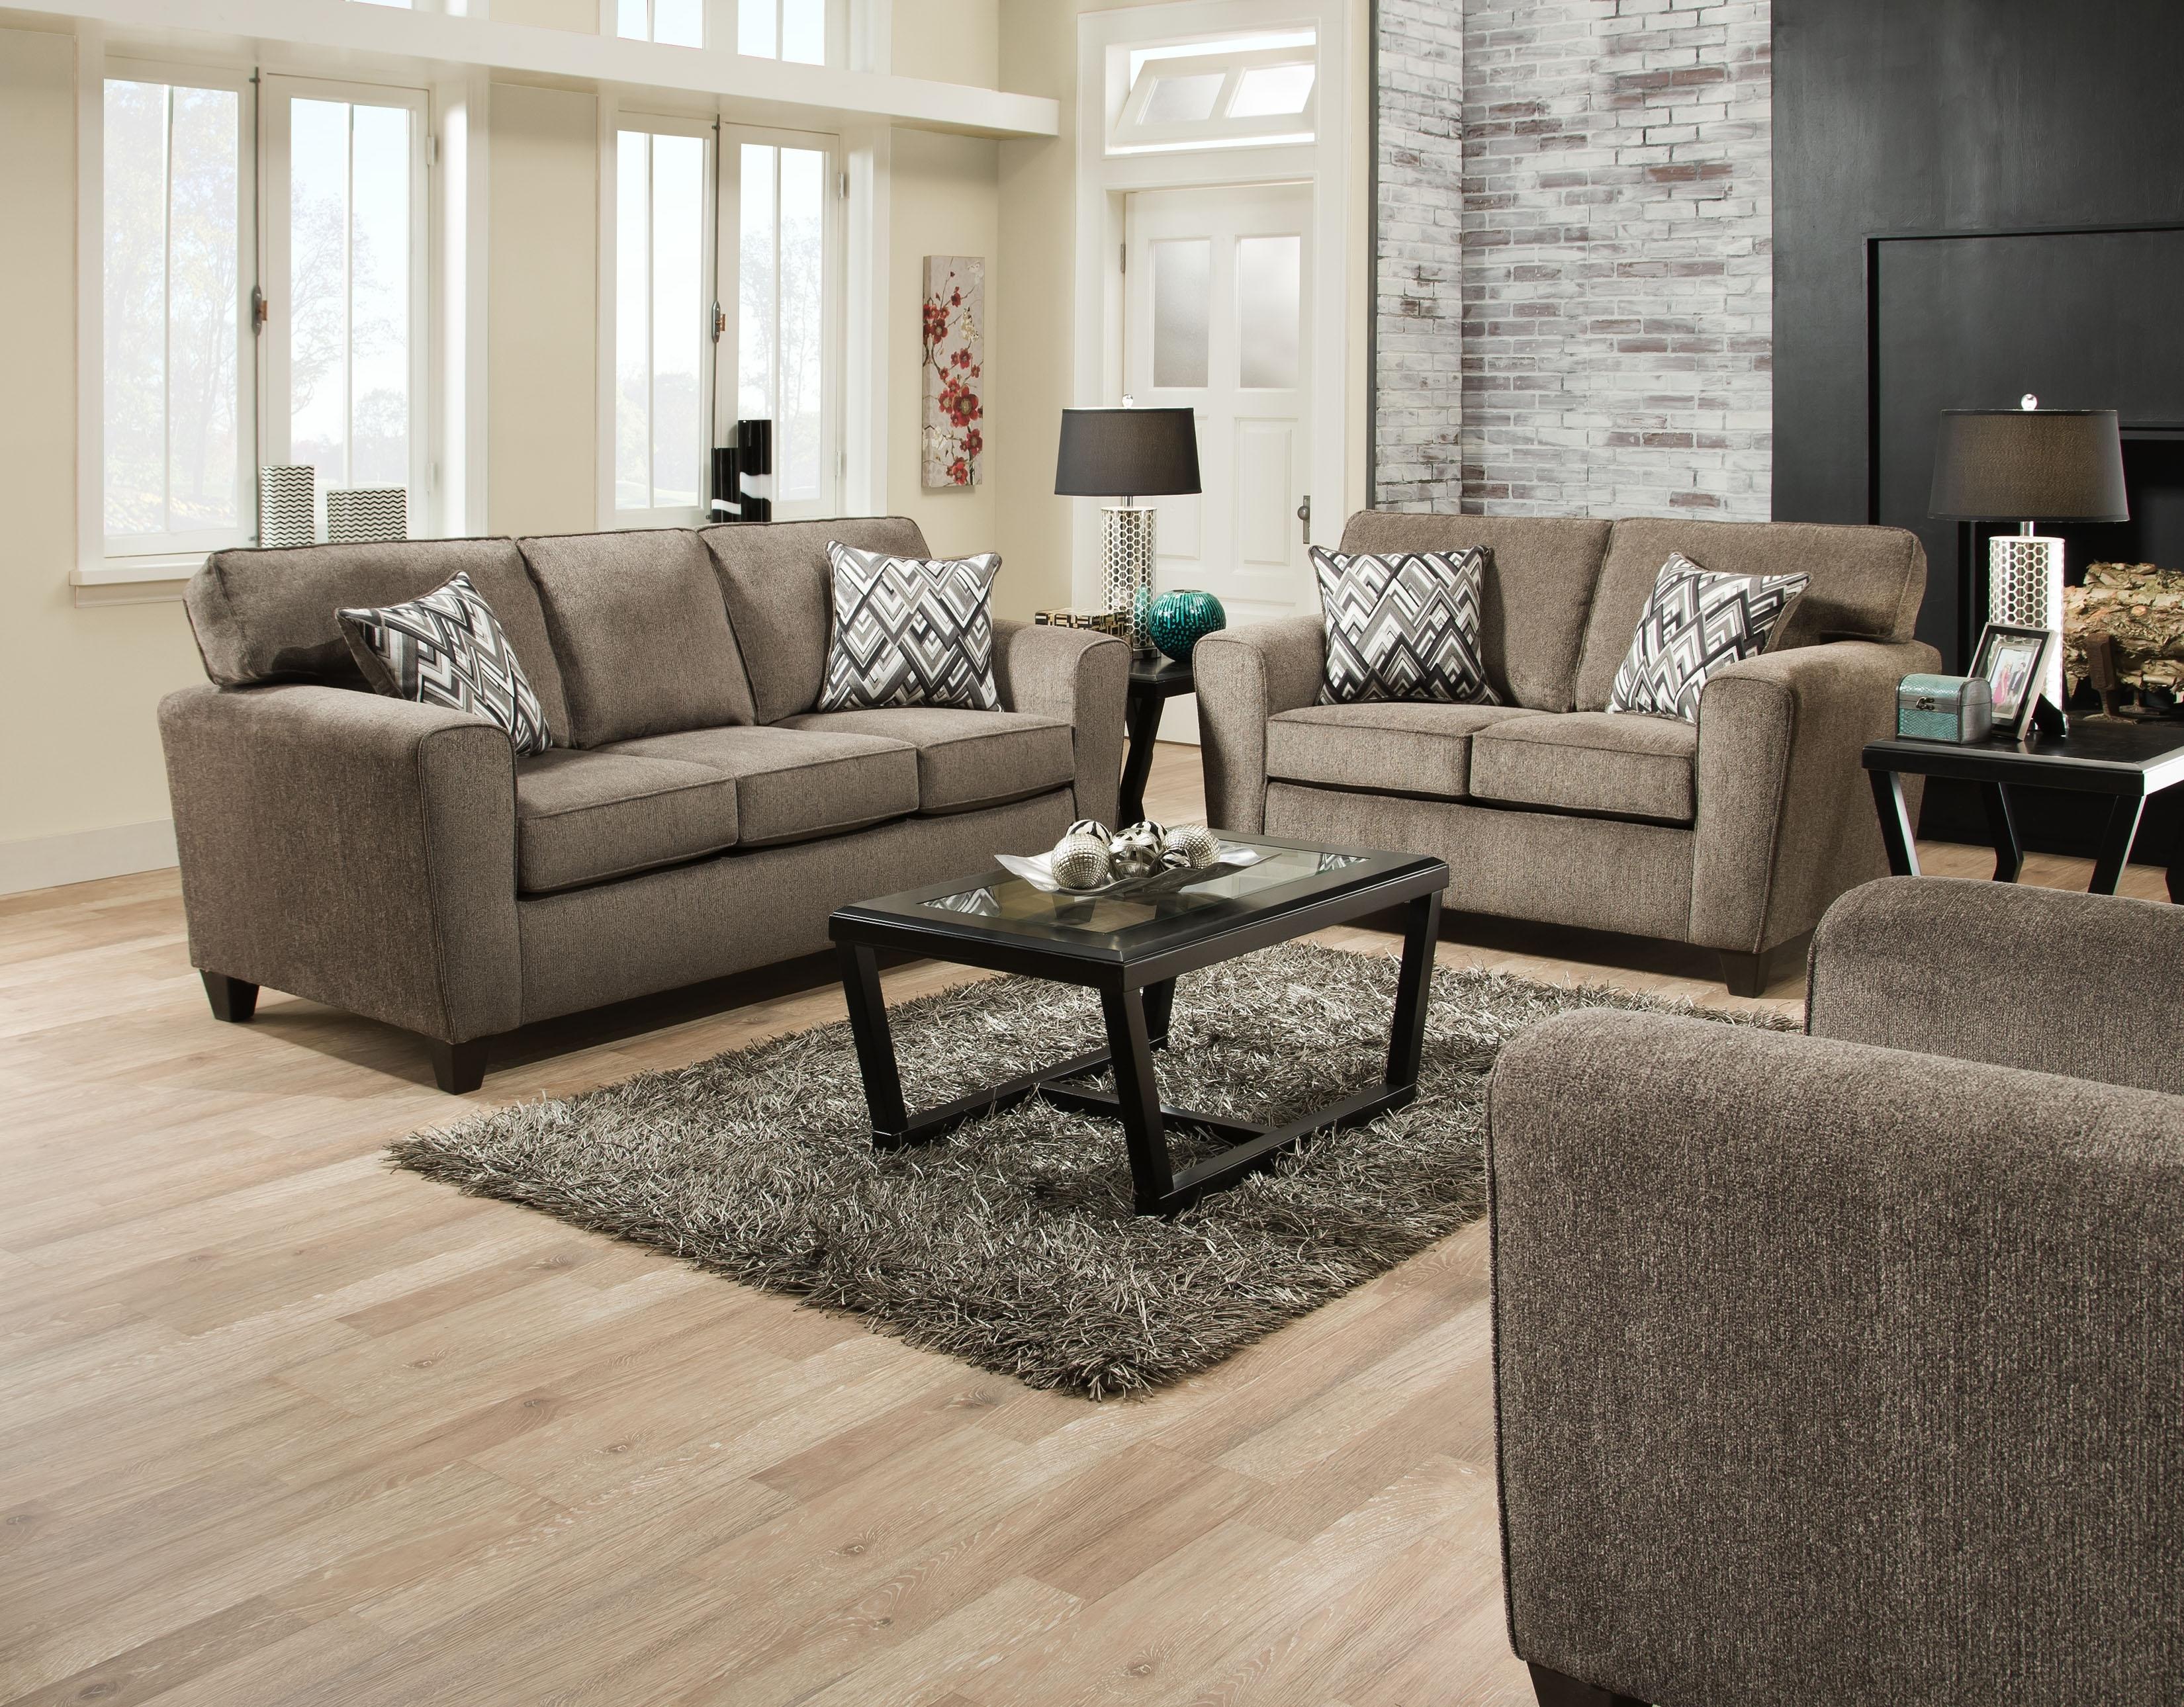 Living Room – Crazy Joe's Best Deal Furniture Inside Janesville Wi Sectional Sofas (Image 5 of 10)